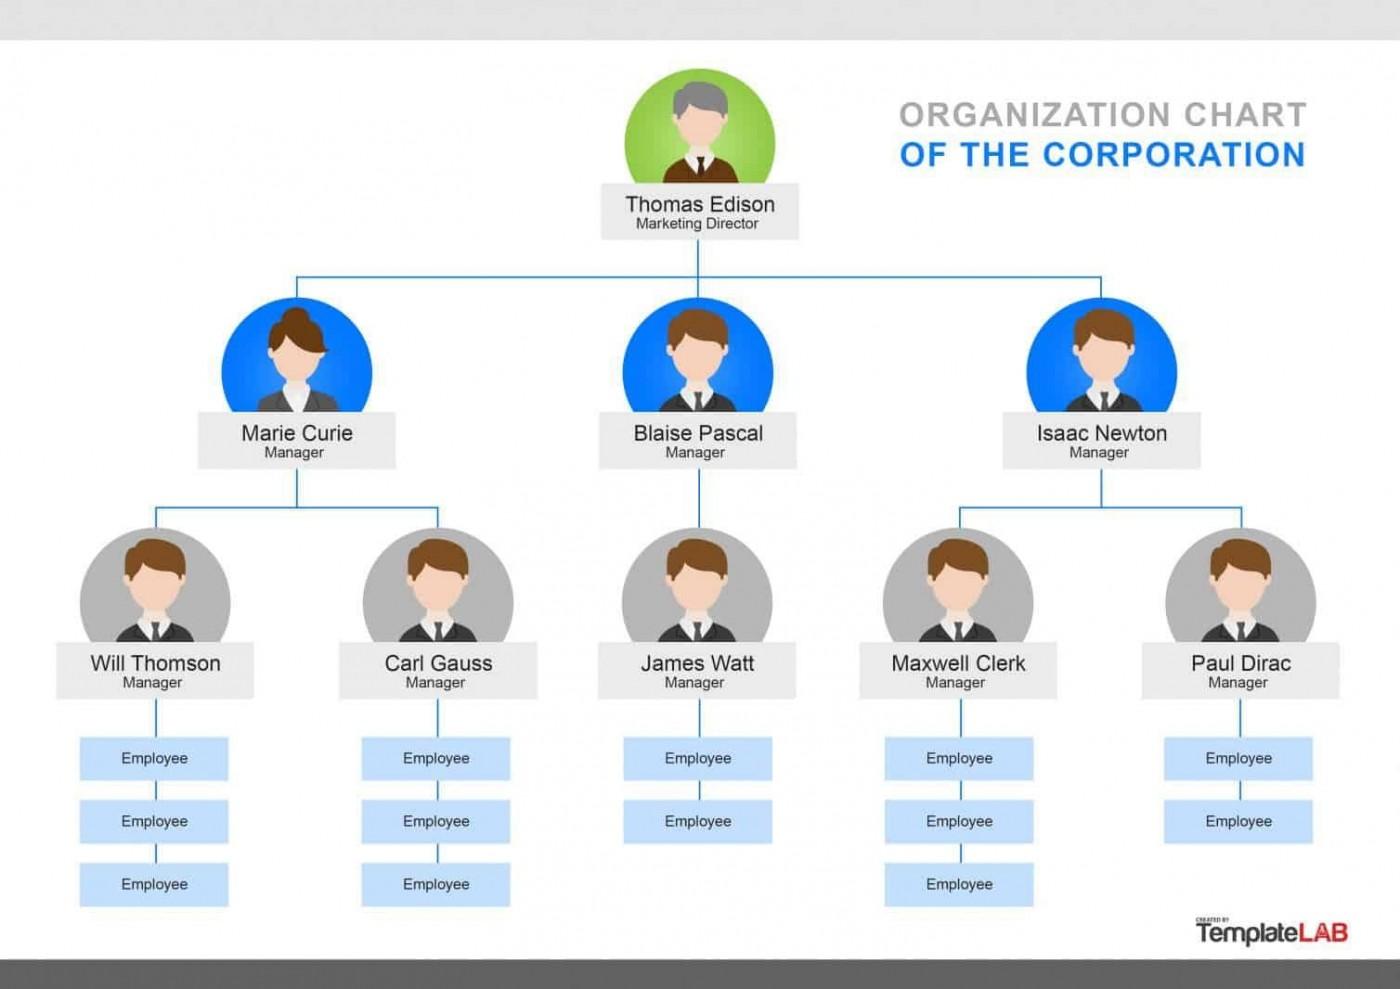 000 Singular Organizational Chart Template Word Concept  2013 2010 20071400